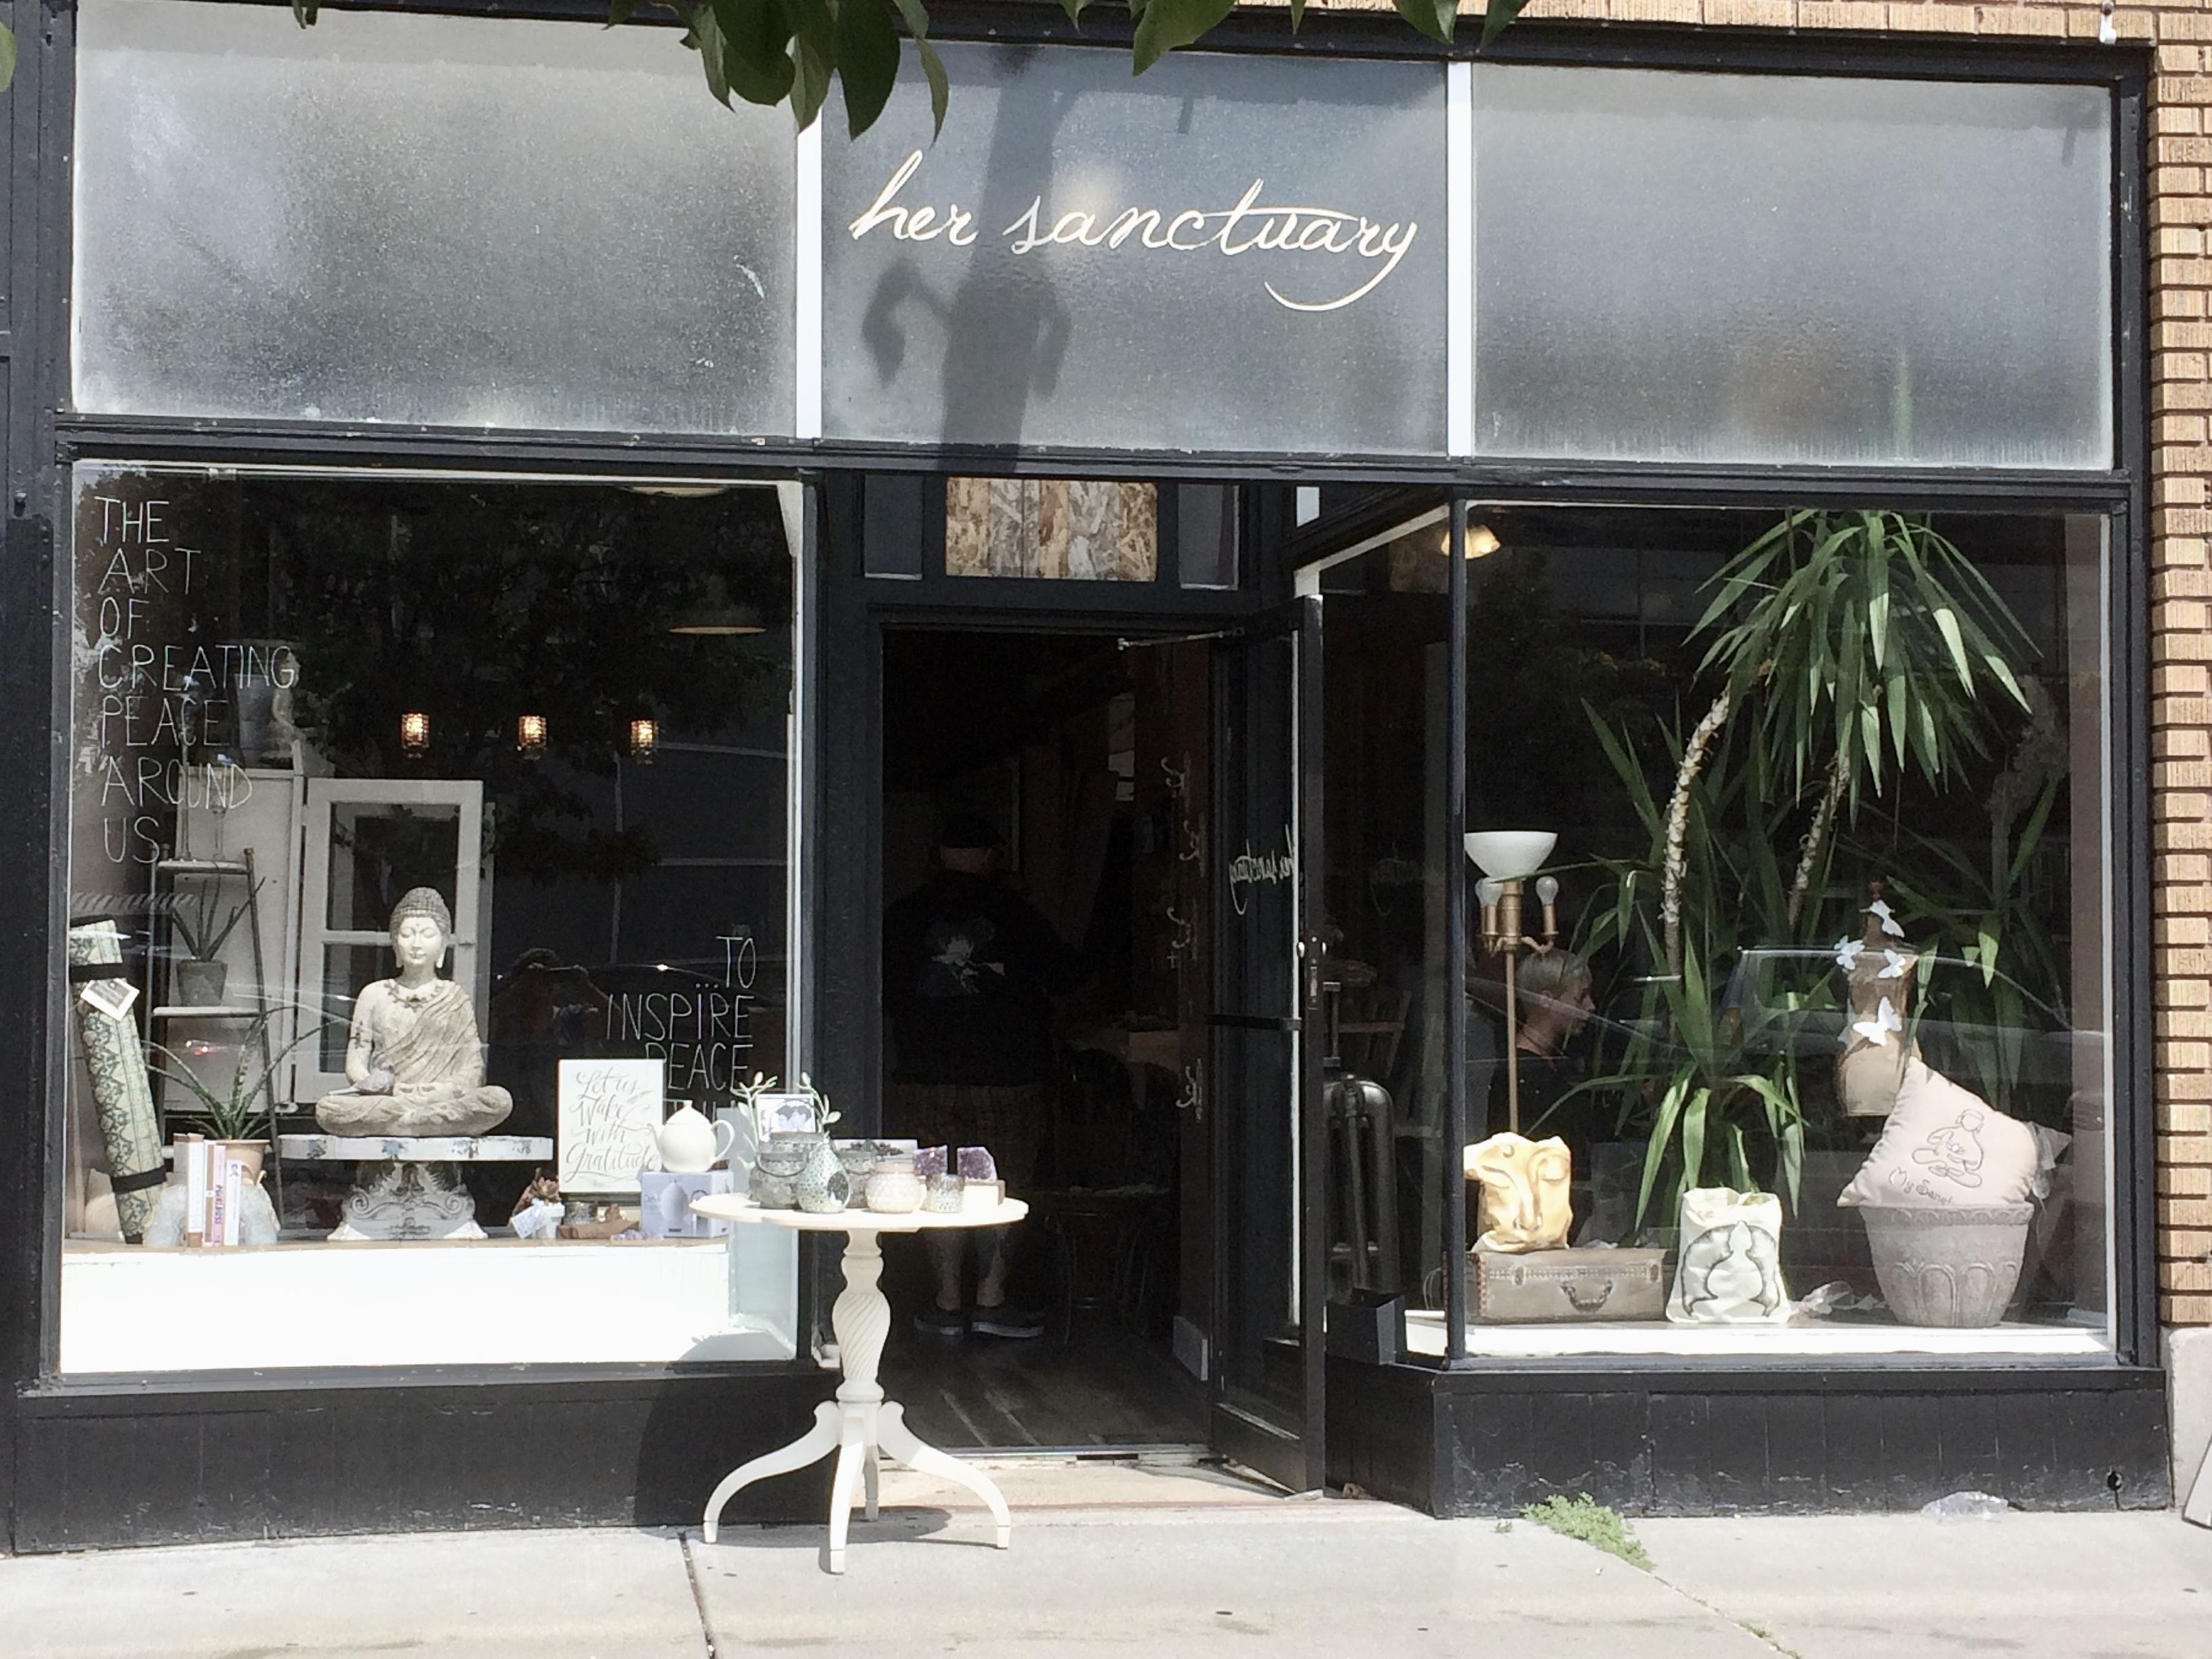 Hertel Ave. Spiritual Shop